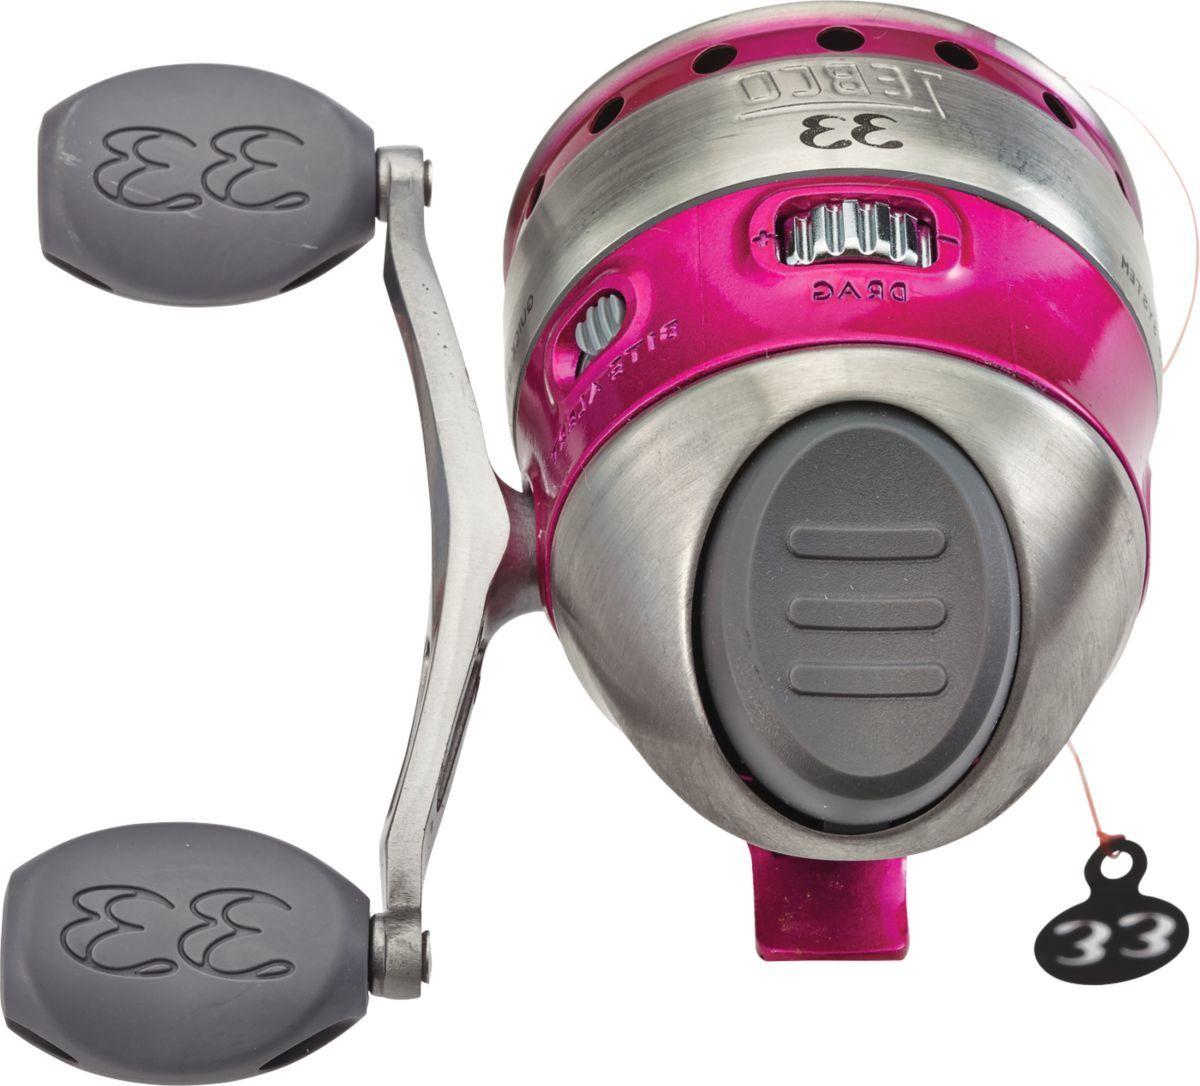 Zebco® Authentic 33 Ladies Spincast Reel